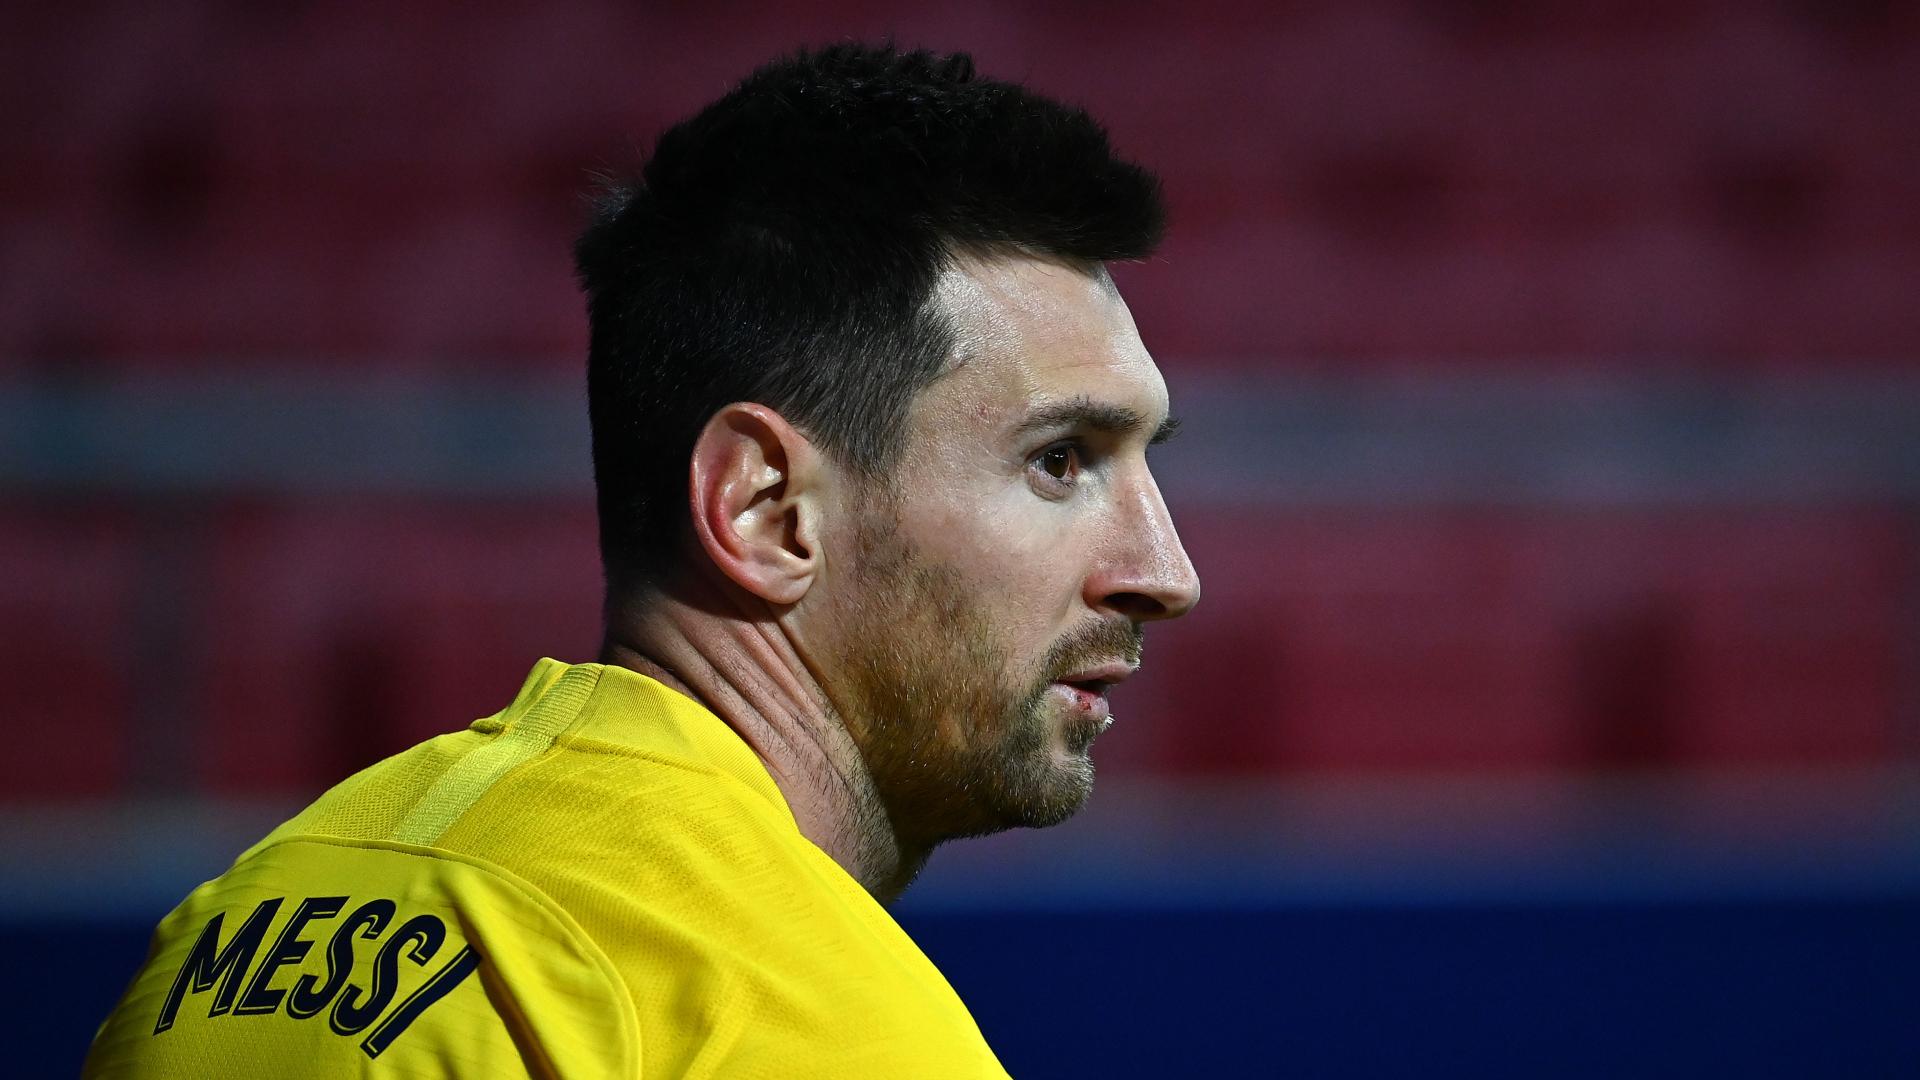 Koeman hails 'decisive' Messi and insists Barcelona can still win La Liga